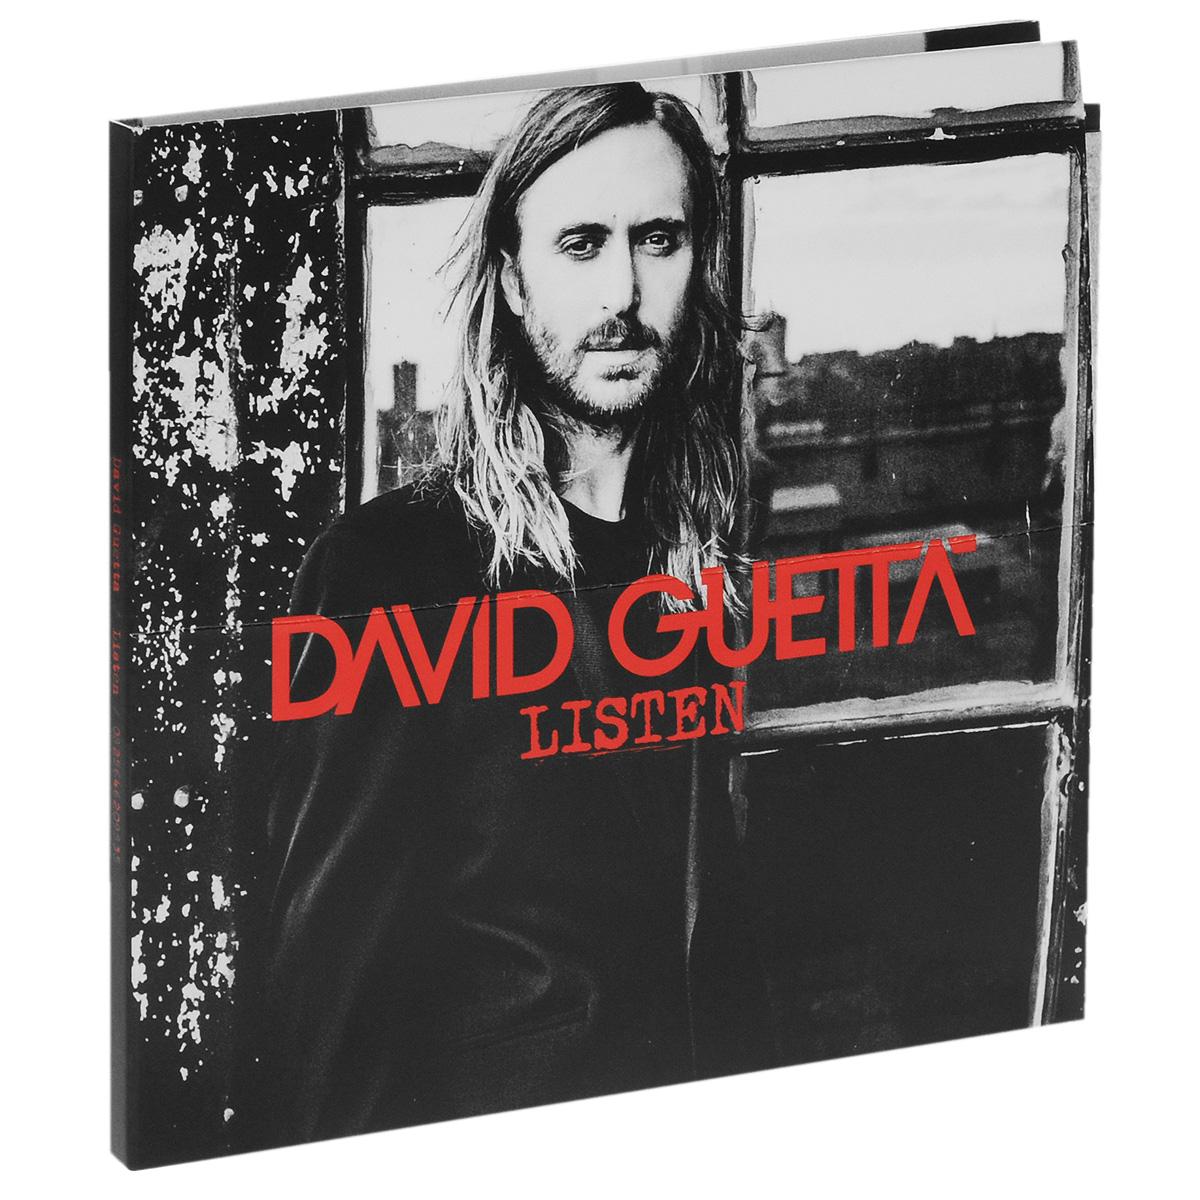 Дэвид Гетта David Guetta. Listen. Limited Edition (2 CD) дэвид гилмор david gilmour live in gdansk 2 cd dvd